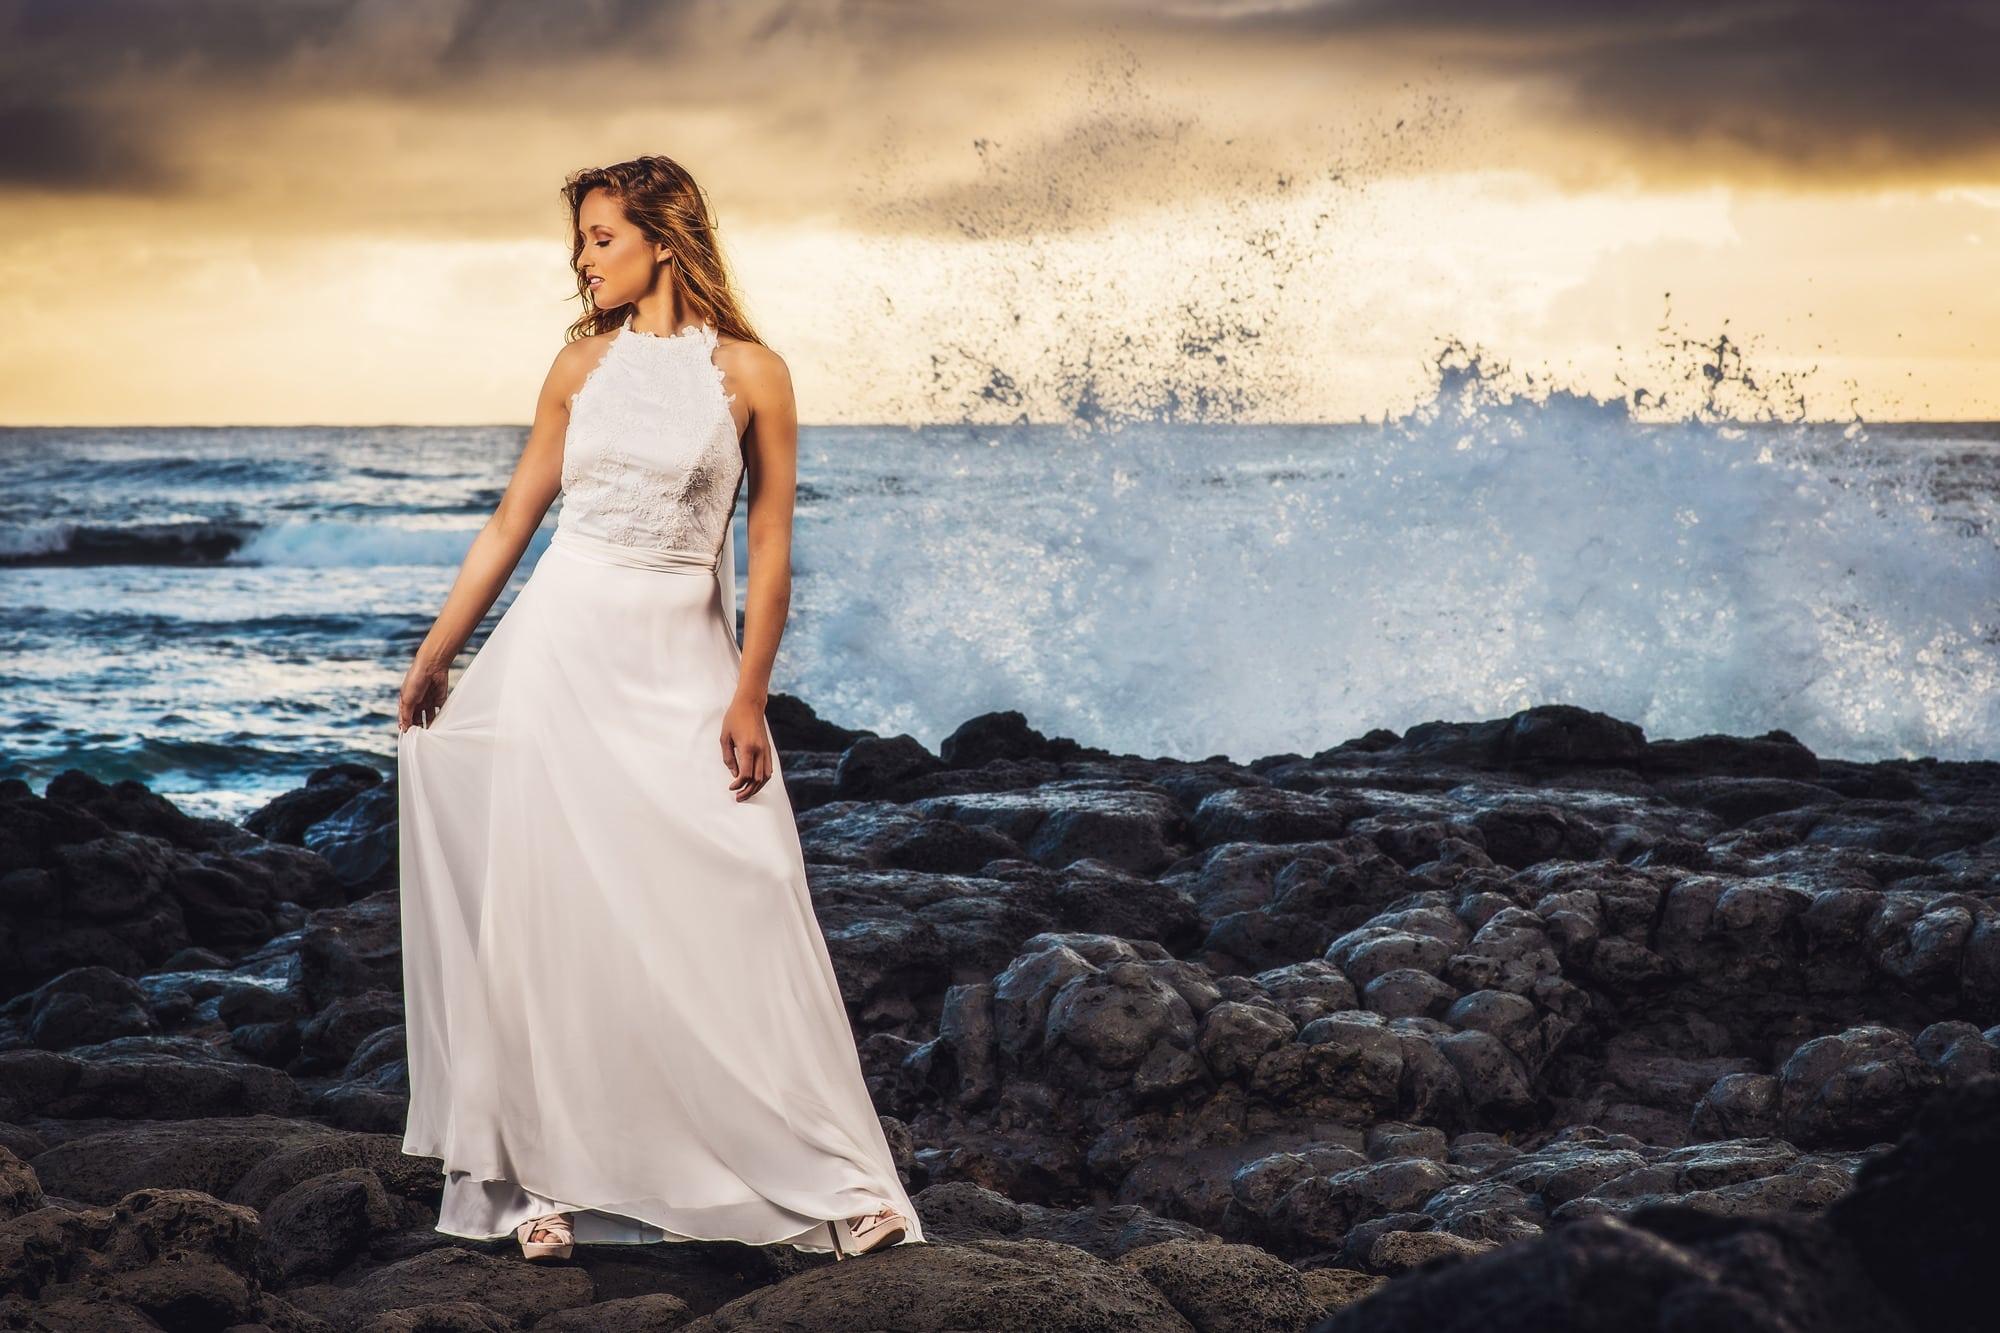 Early Morning Bridal Shoot-6.jpg